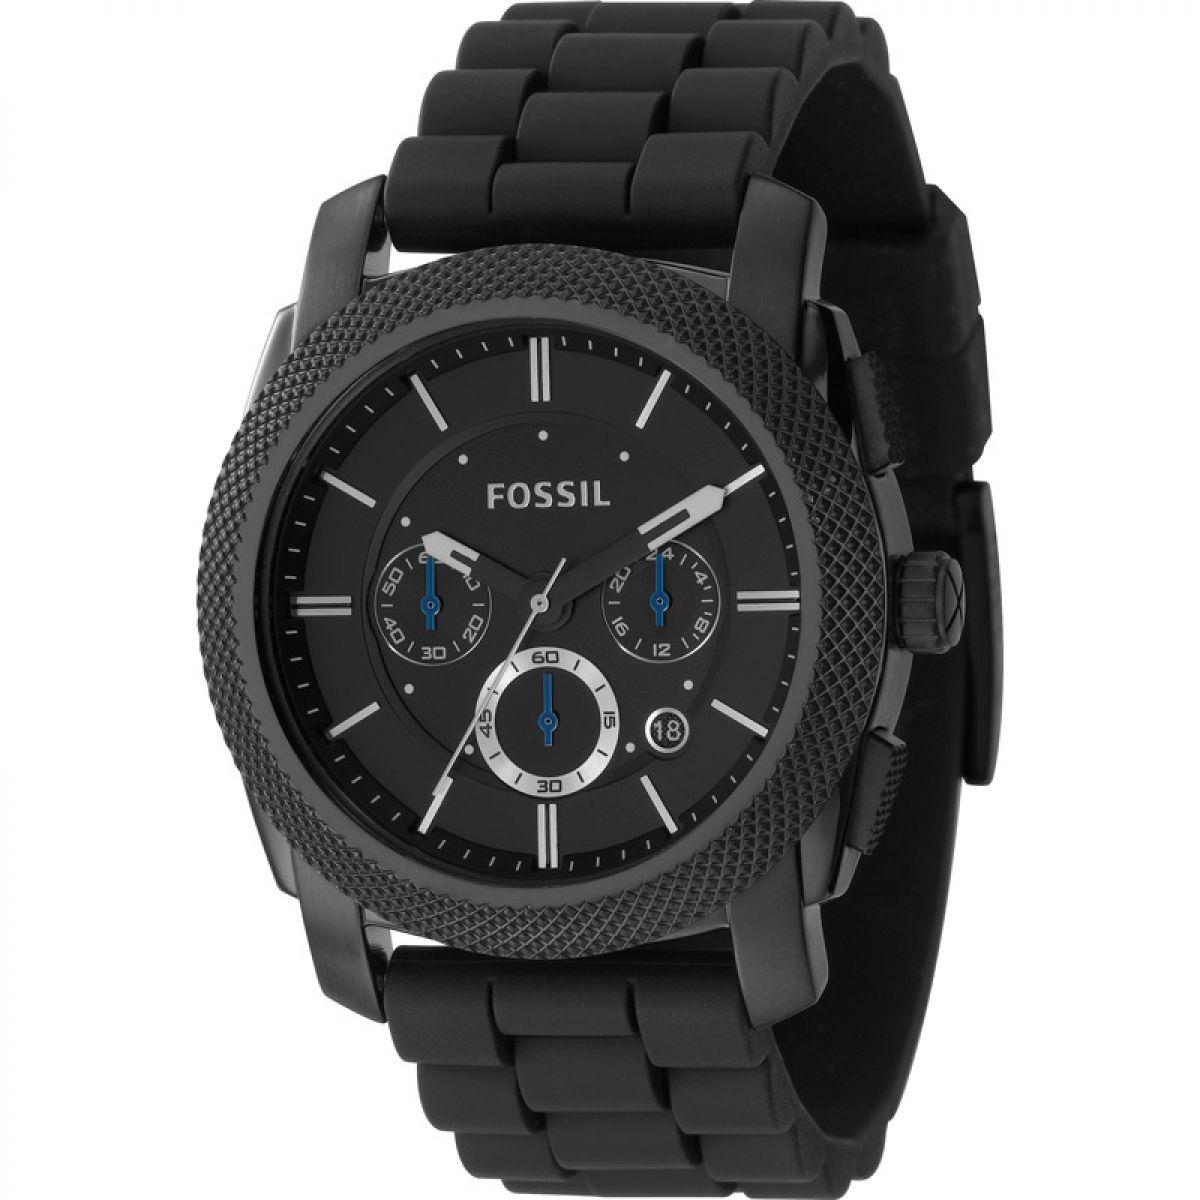 gents fossil machine chronograph watch fs4487 watchshop com rh watchshop com Fossil FS4487 Watch fossil fs4487 user manual